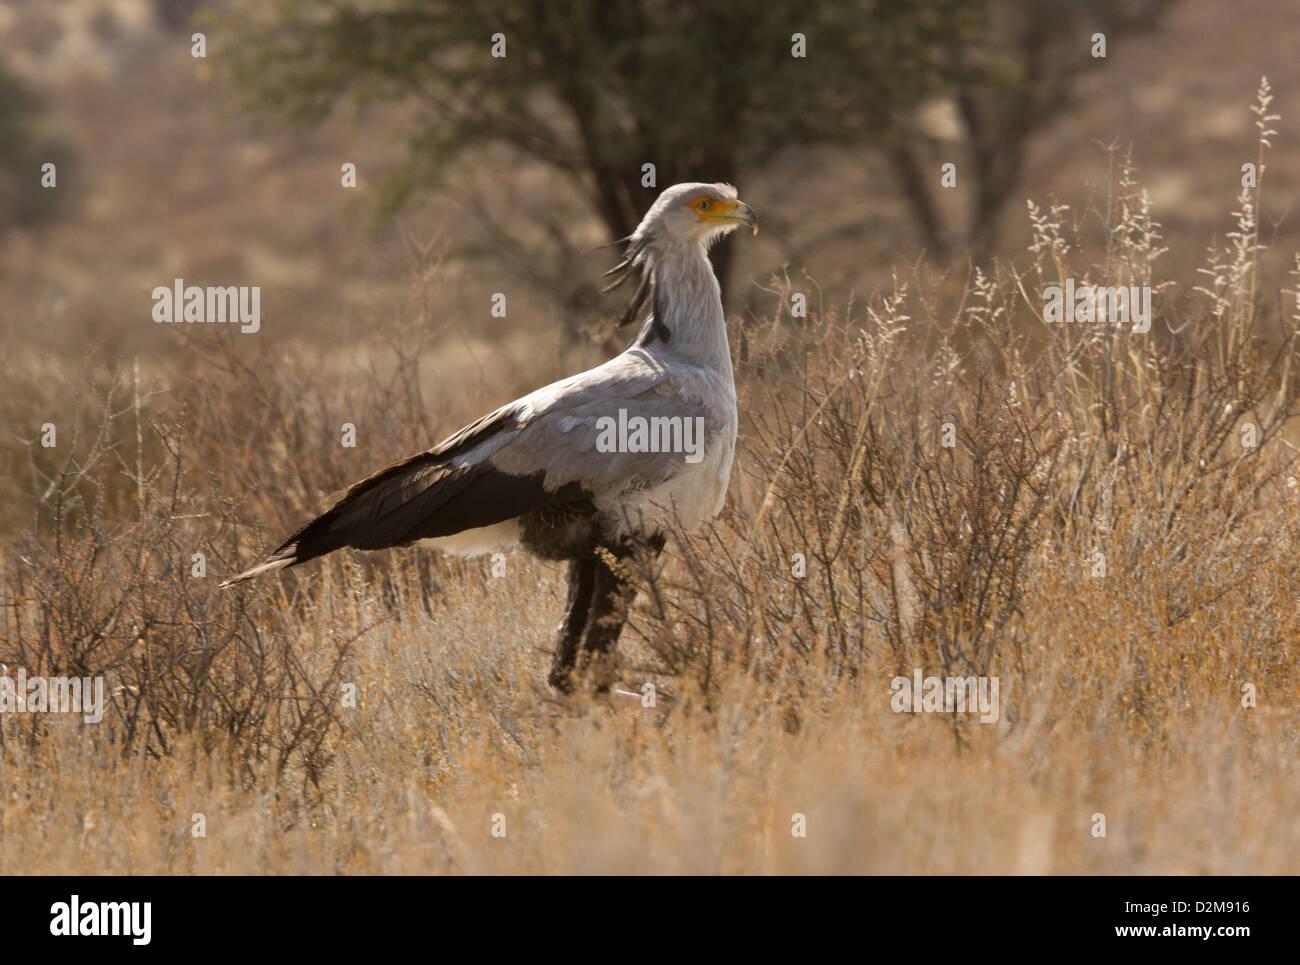 Secretarybird (Sagittarius serpentarius) feeding in dry grassland, Kalahari desert, South Africa Stock Photo